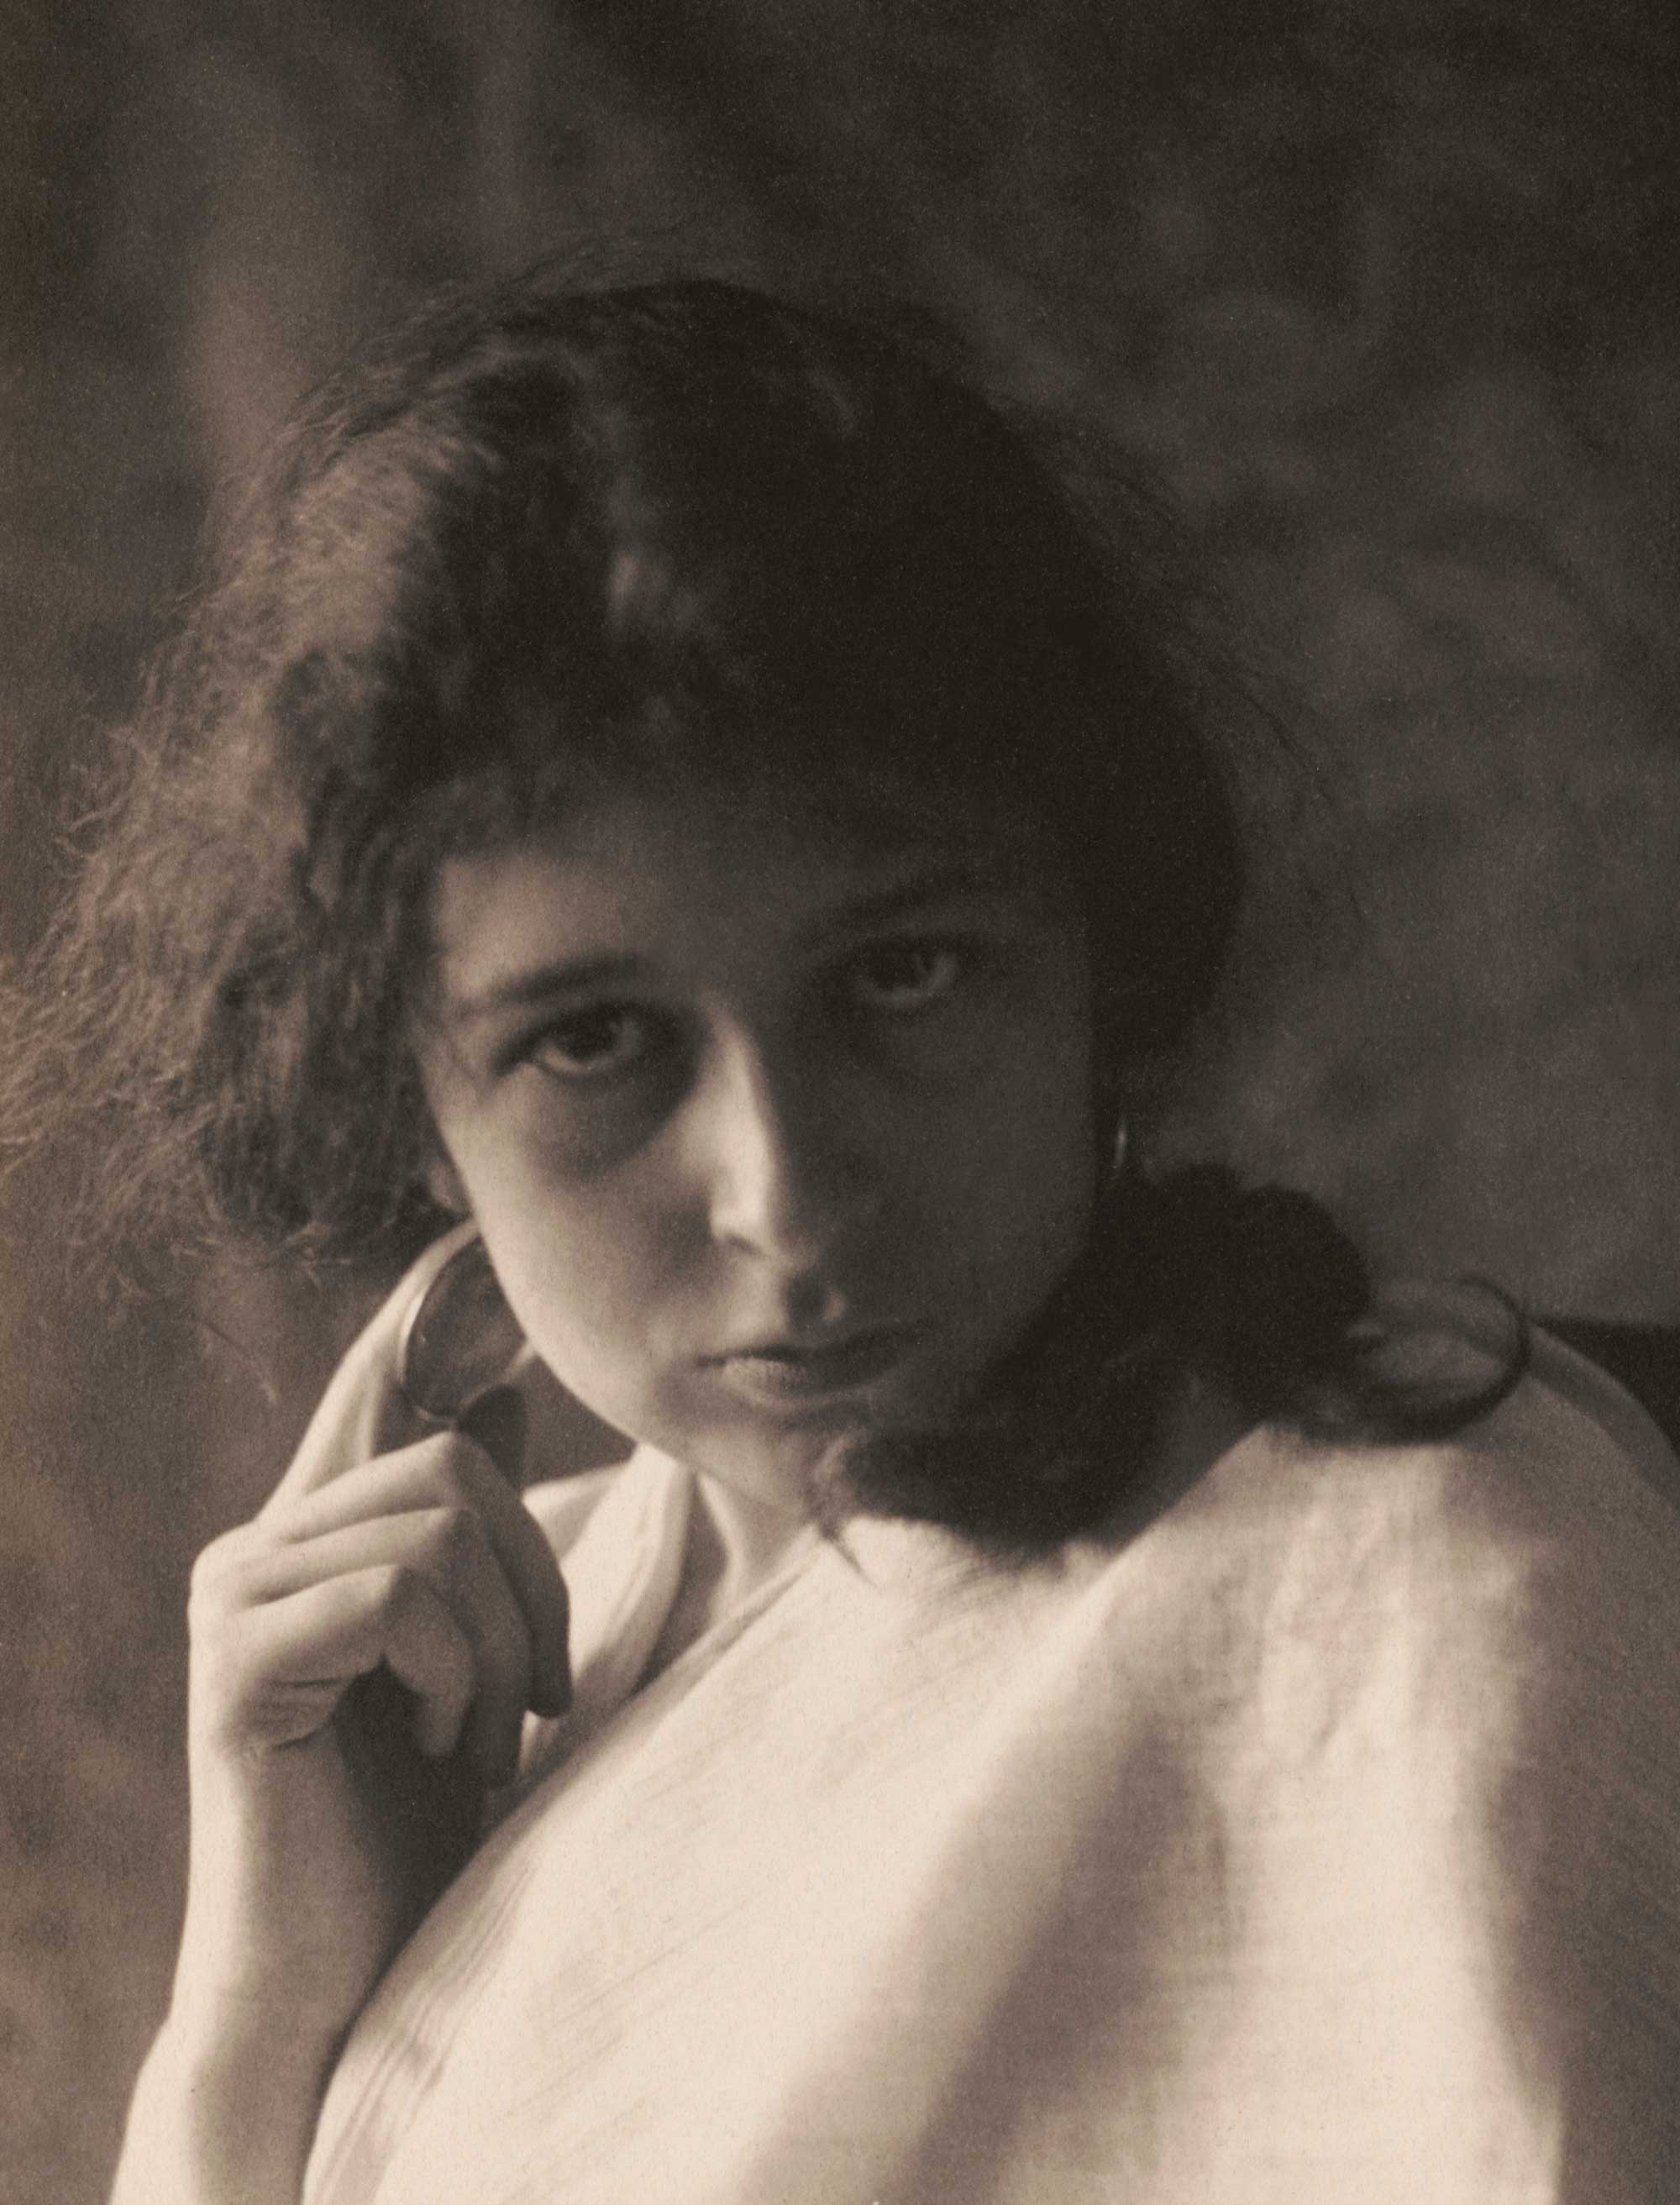 c. 1898: 'Woman in drapery with hoop earrings'